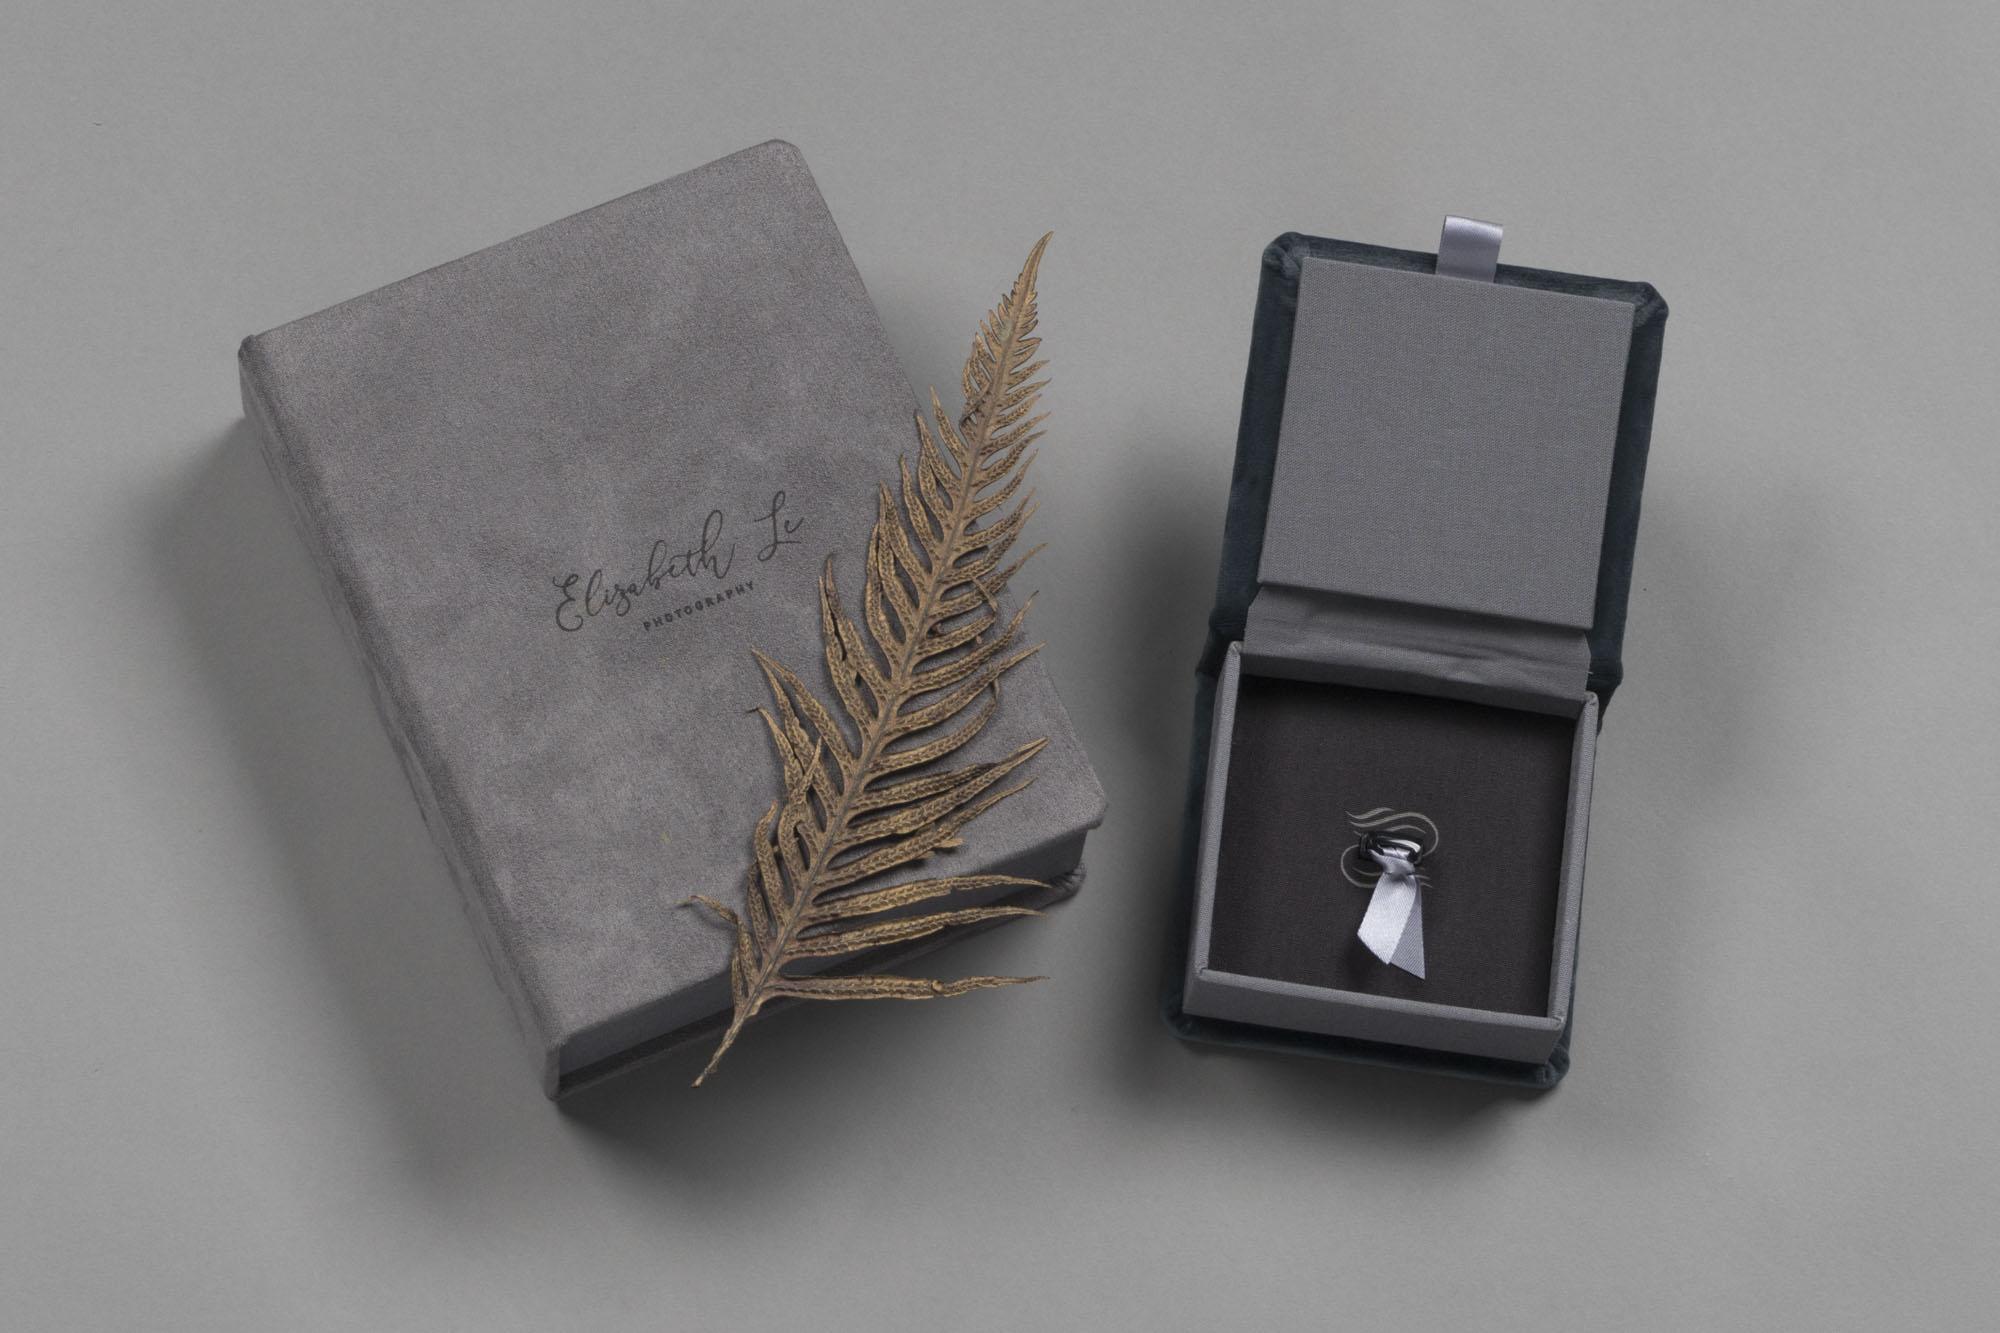 Professional Velvet USB Box and Folio Box